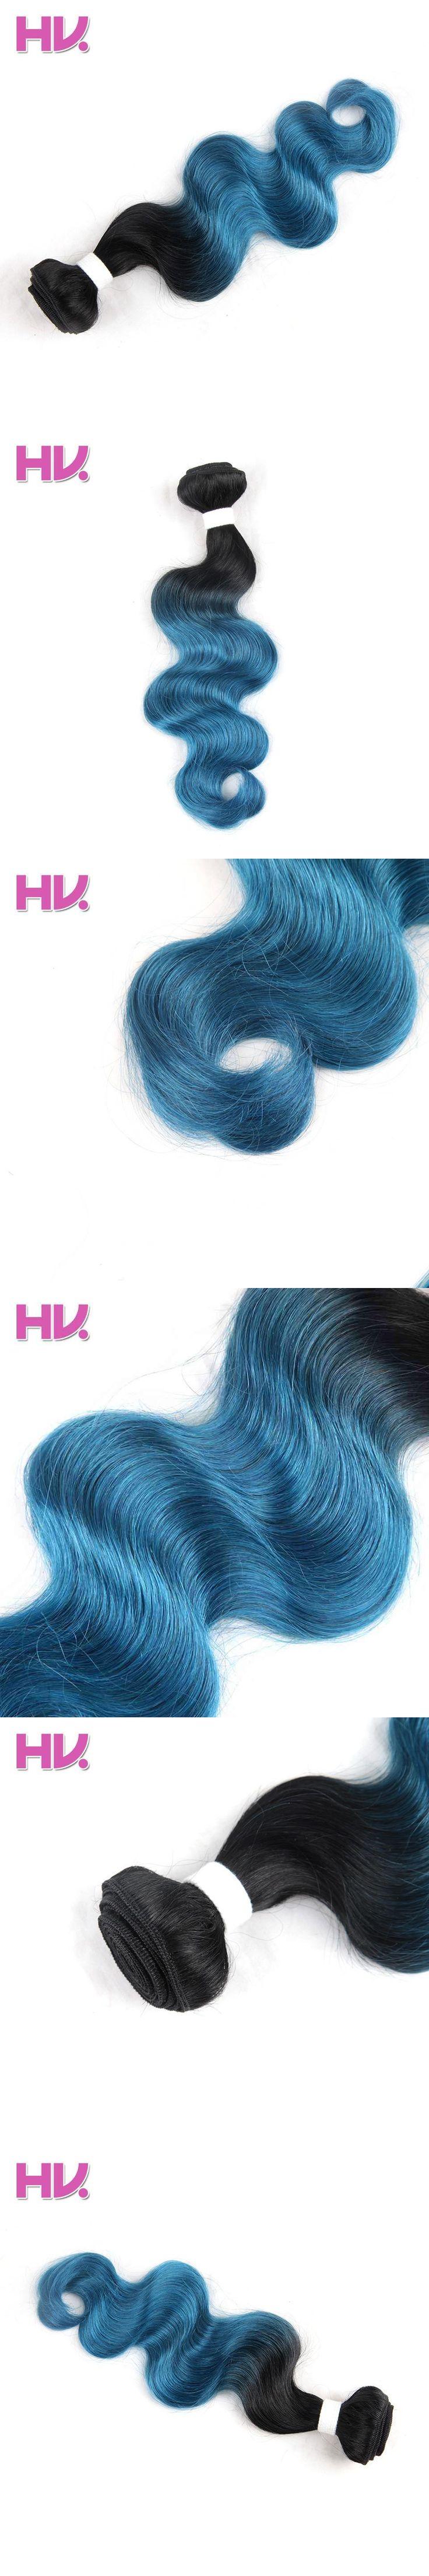 Hair Villa Pre-colored Human Hair Weave Brazilian Body Wave Hair Extensions OT Ice Blue 10-18 inch Non-Remy Hair Bundles